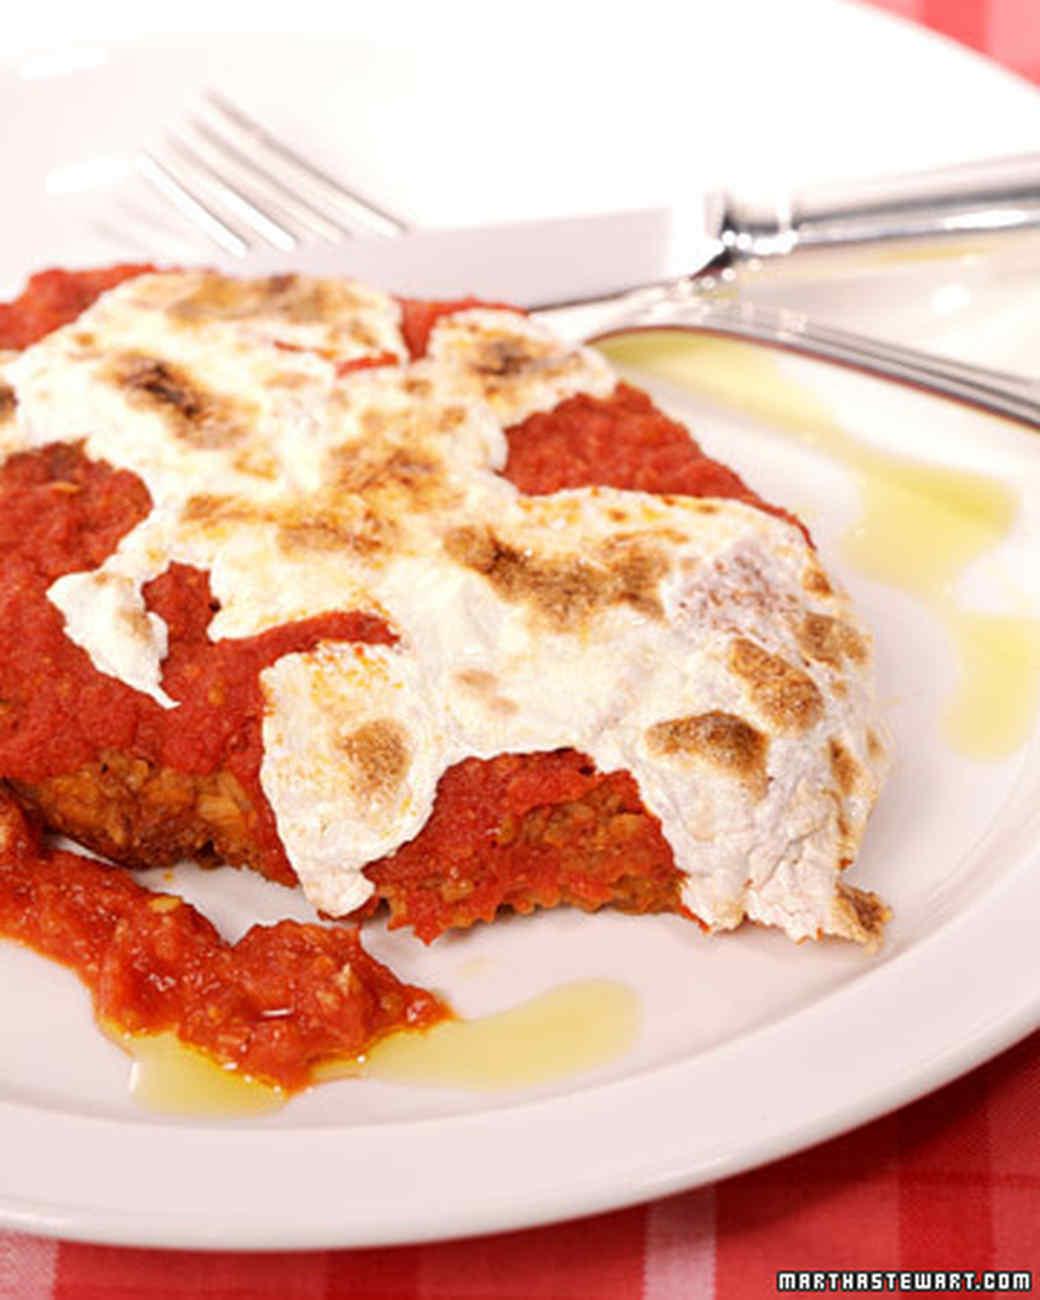 Pino Luongo and Mark Strausman's Chicken Parmigiana